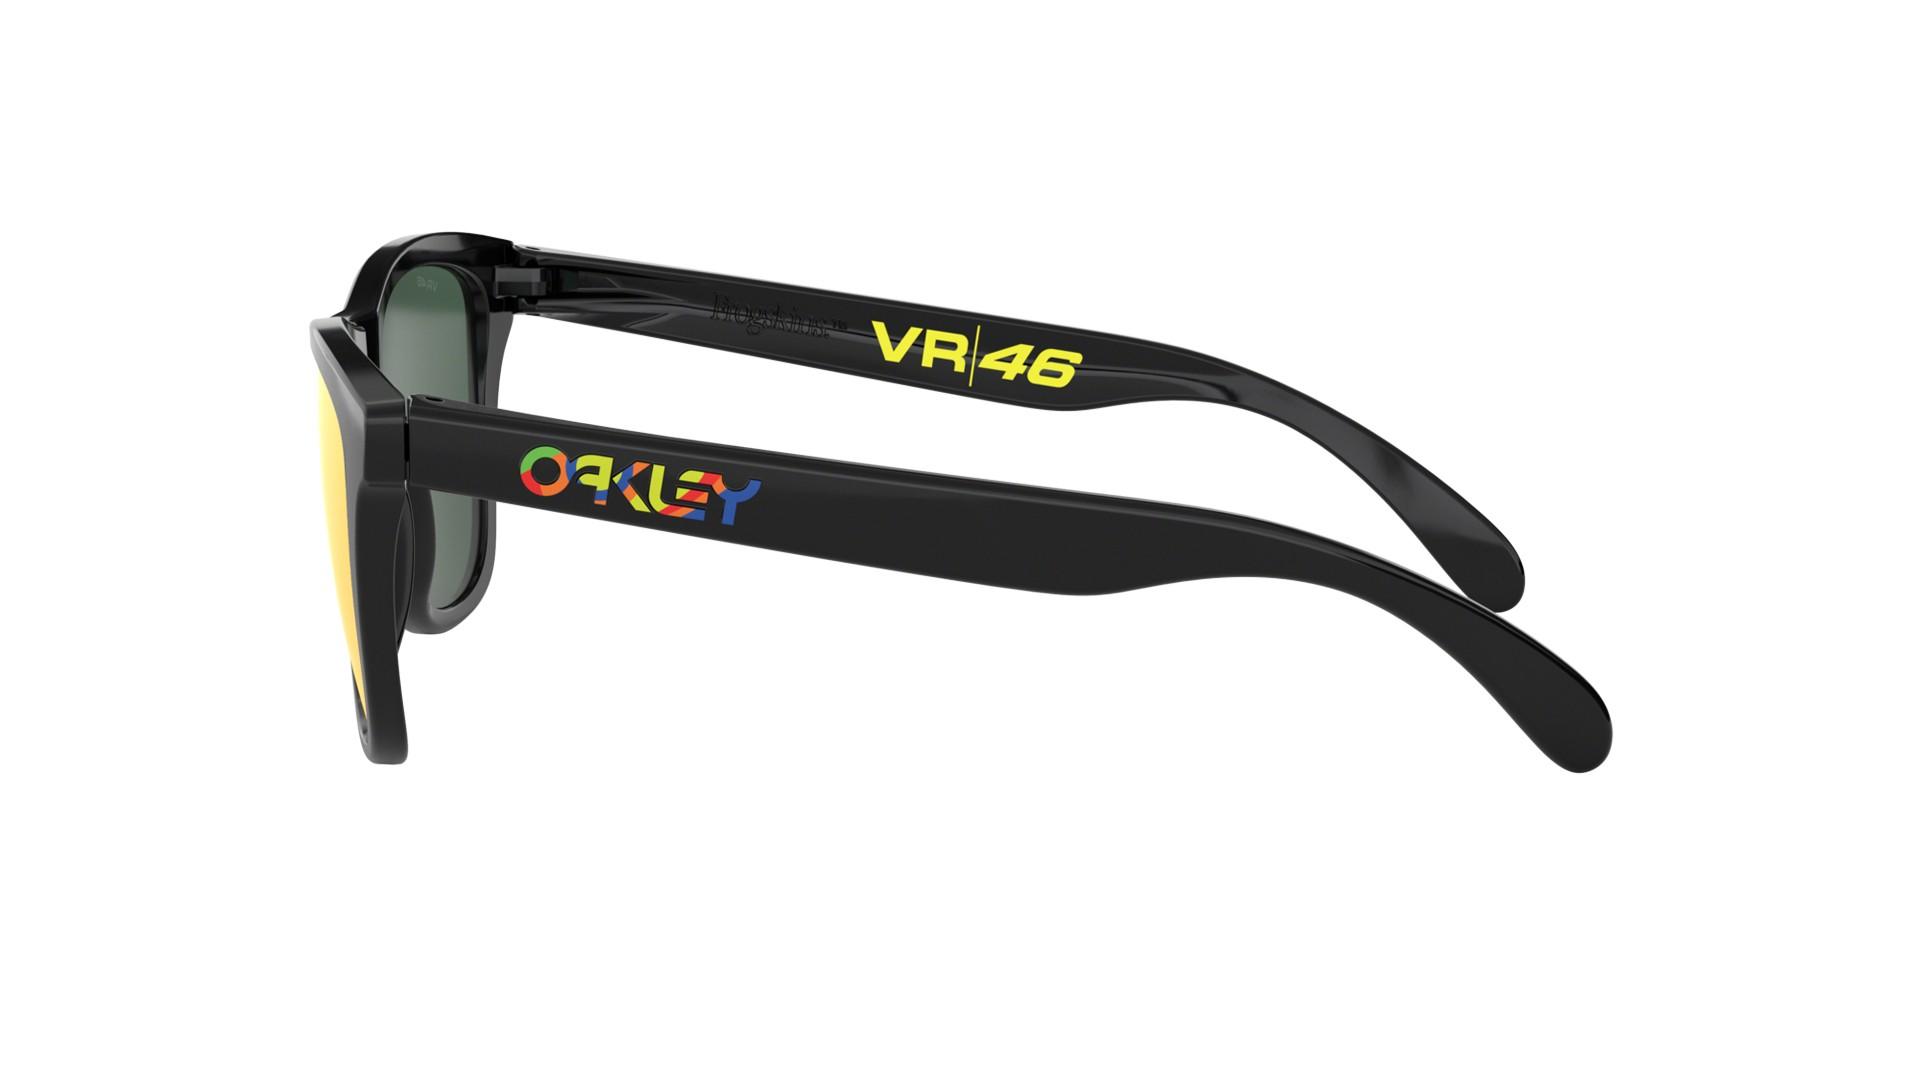 ffb23fbcadf Lunettes de soleil Oakley Frogskins Valentino Rossi Vr46 Noir Prizm OO9013  E6 55-17 Medium Miroirs